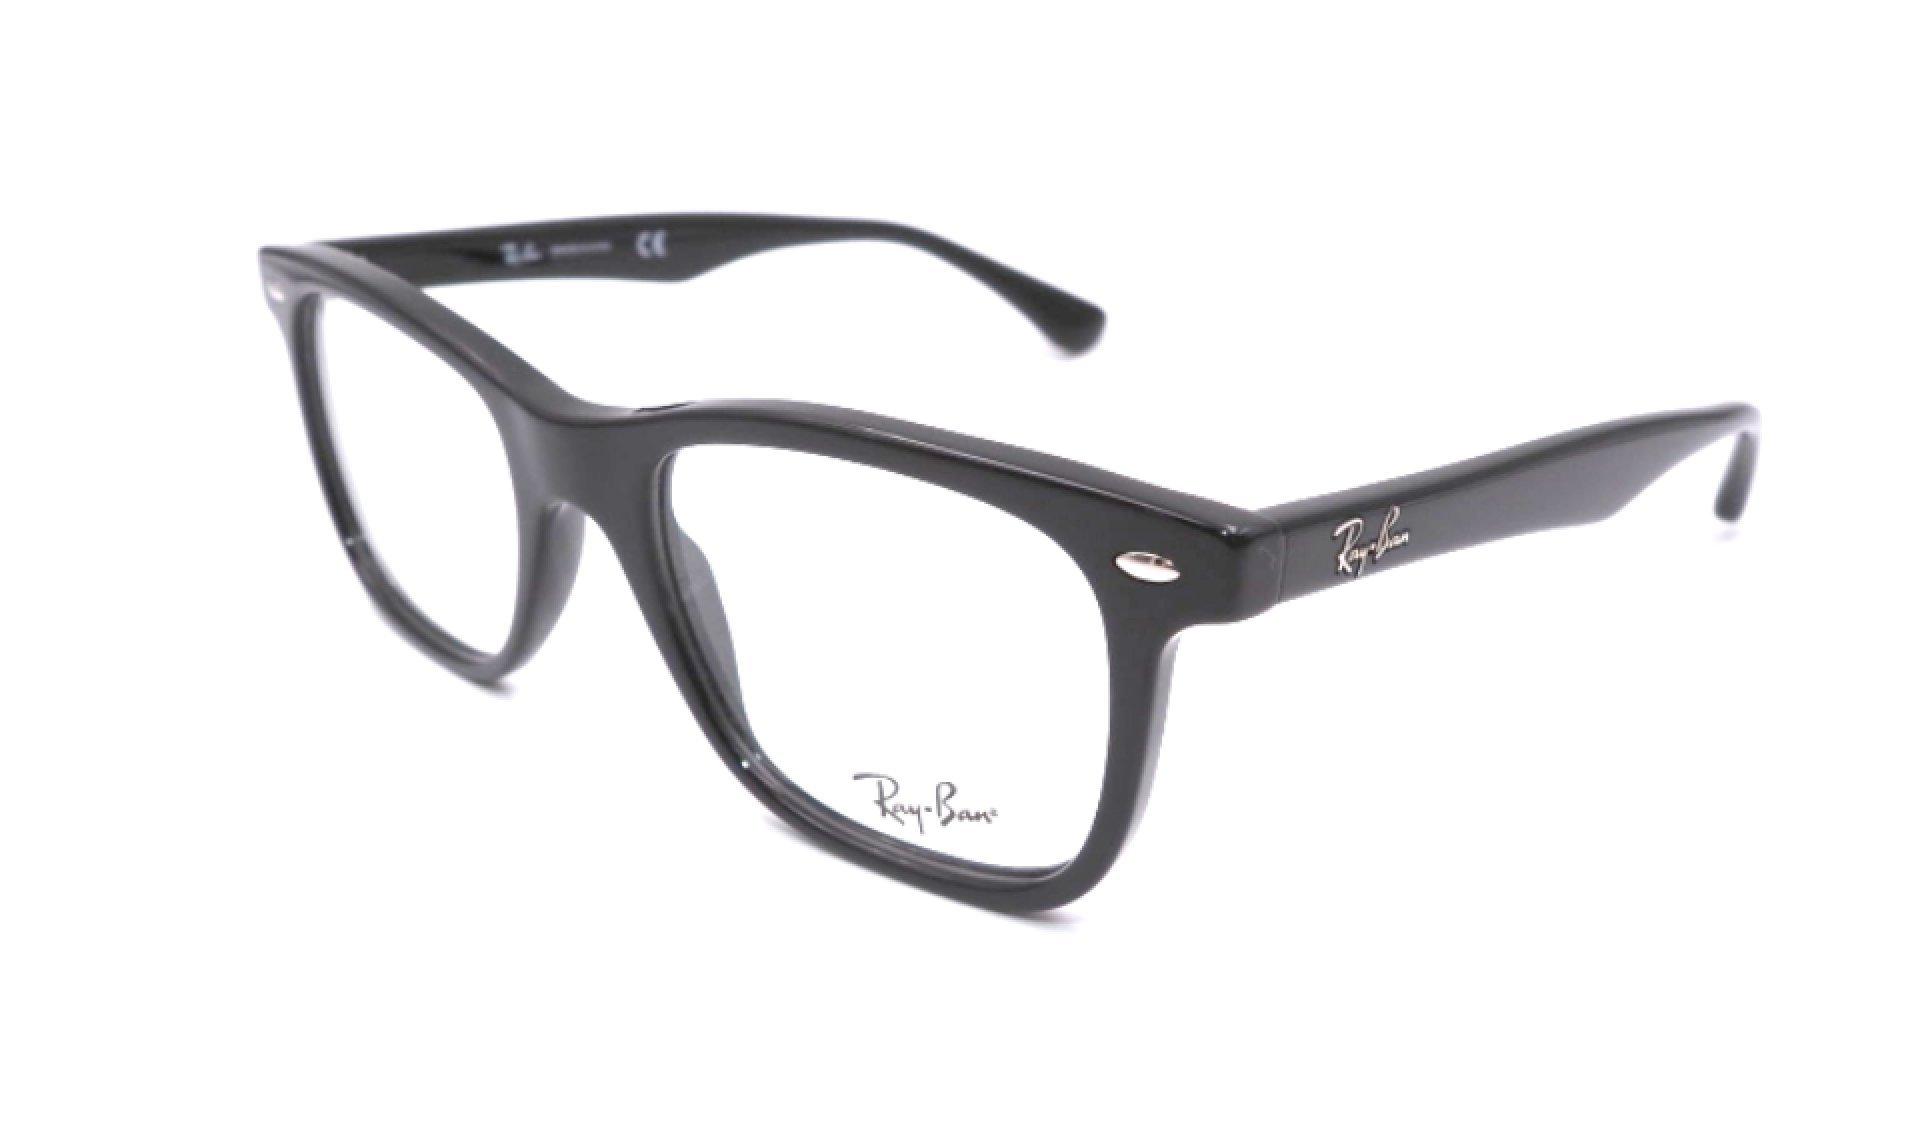 Ray-Ban Men's RX5248 Eyeglasses Shiny Black 49mm by Ray-Ban